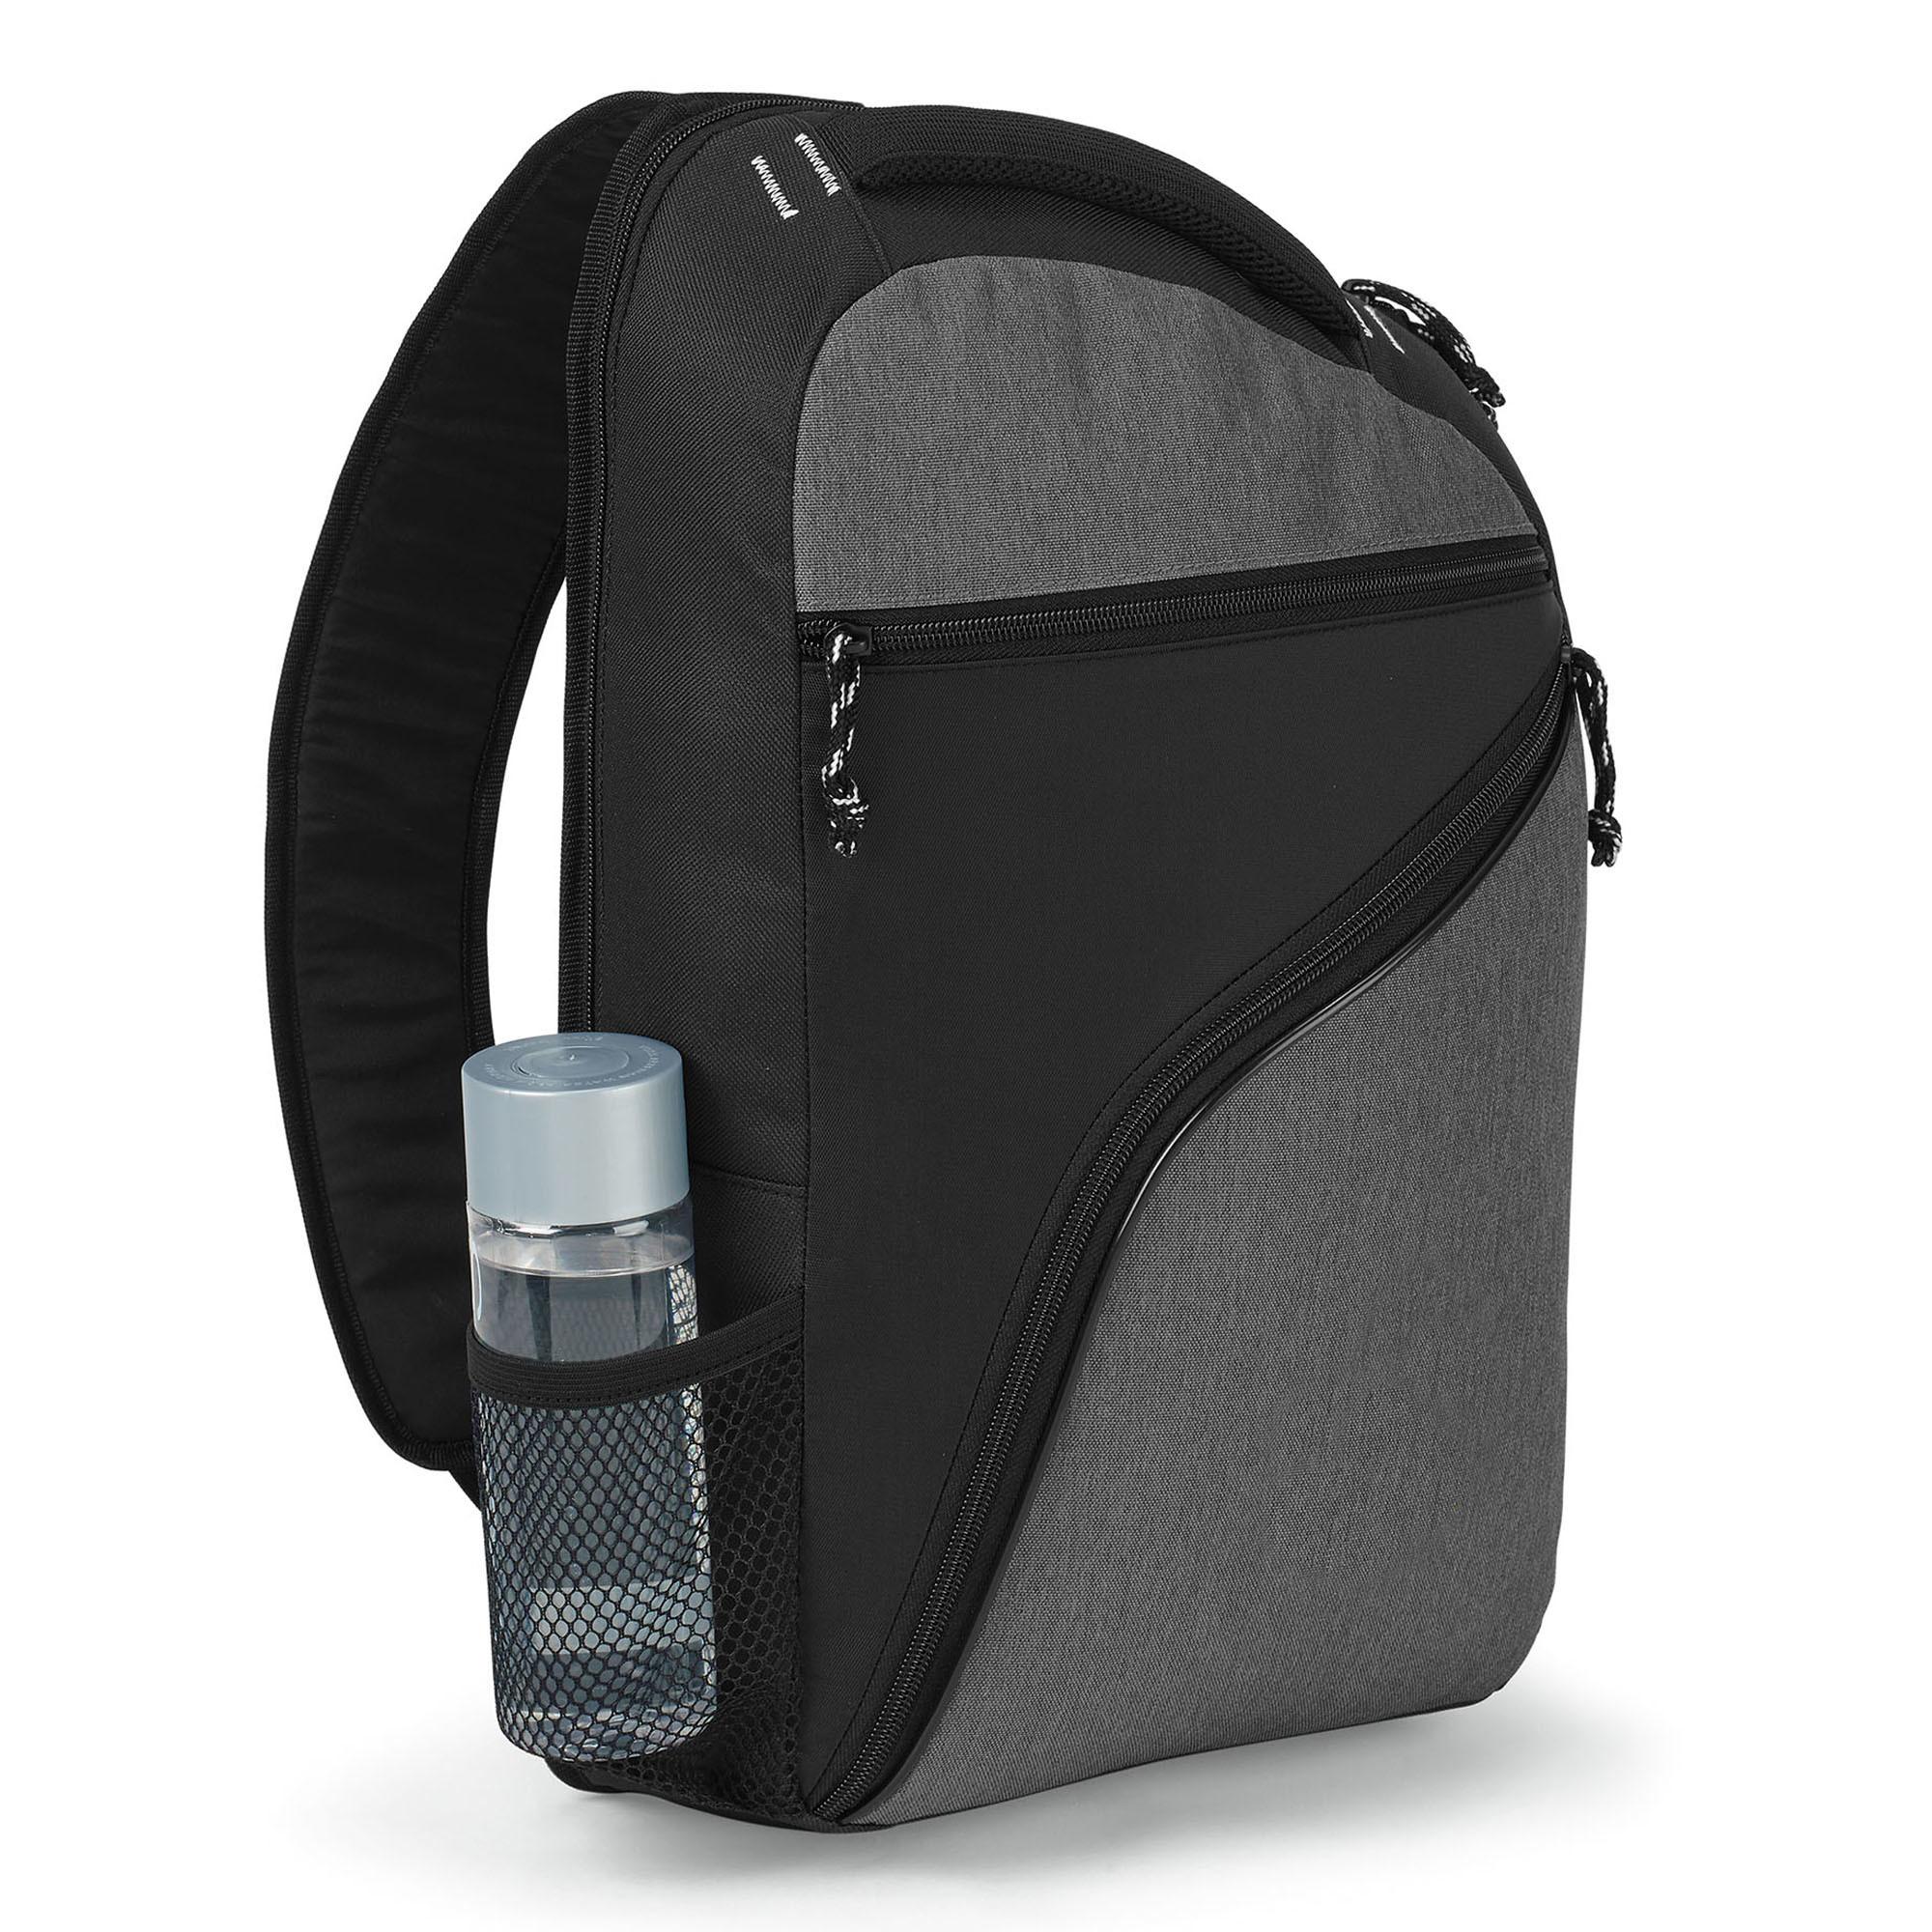 Gemline 5214 - McKinley Computer Sling Bag